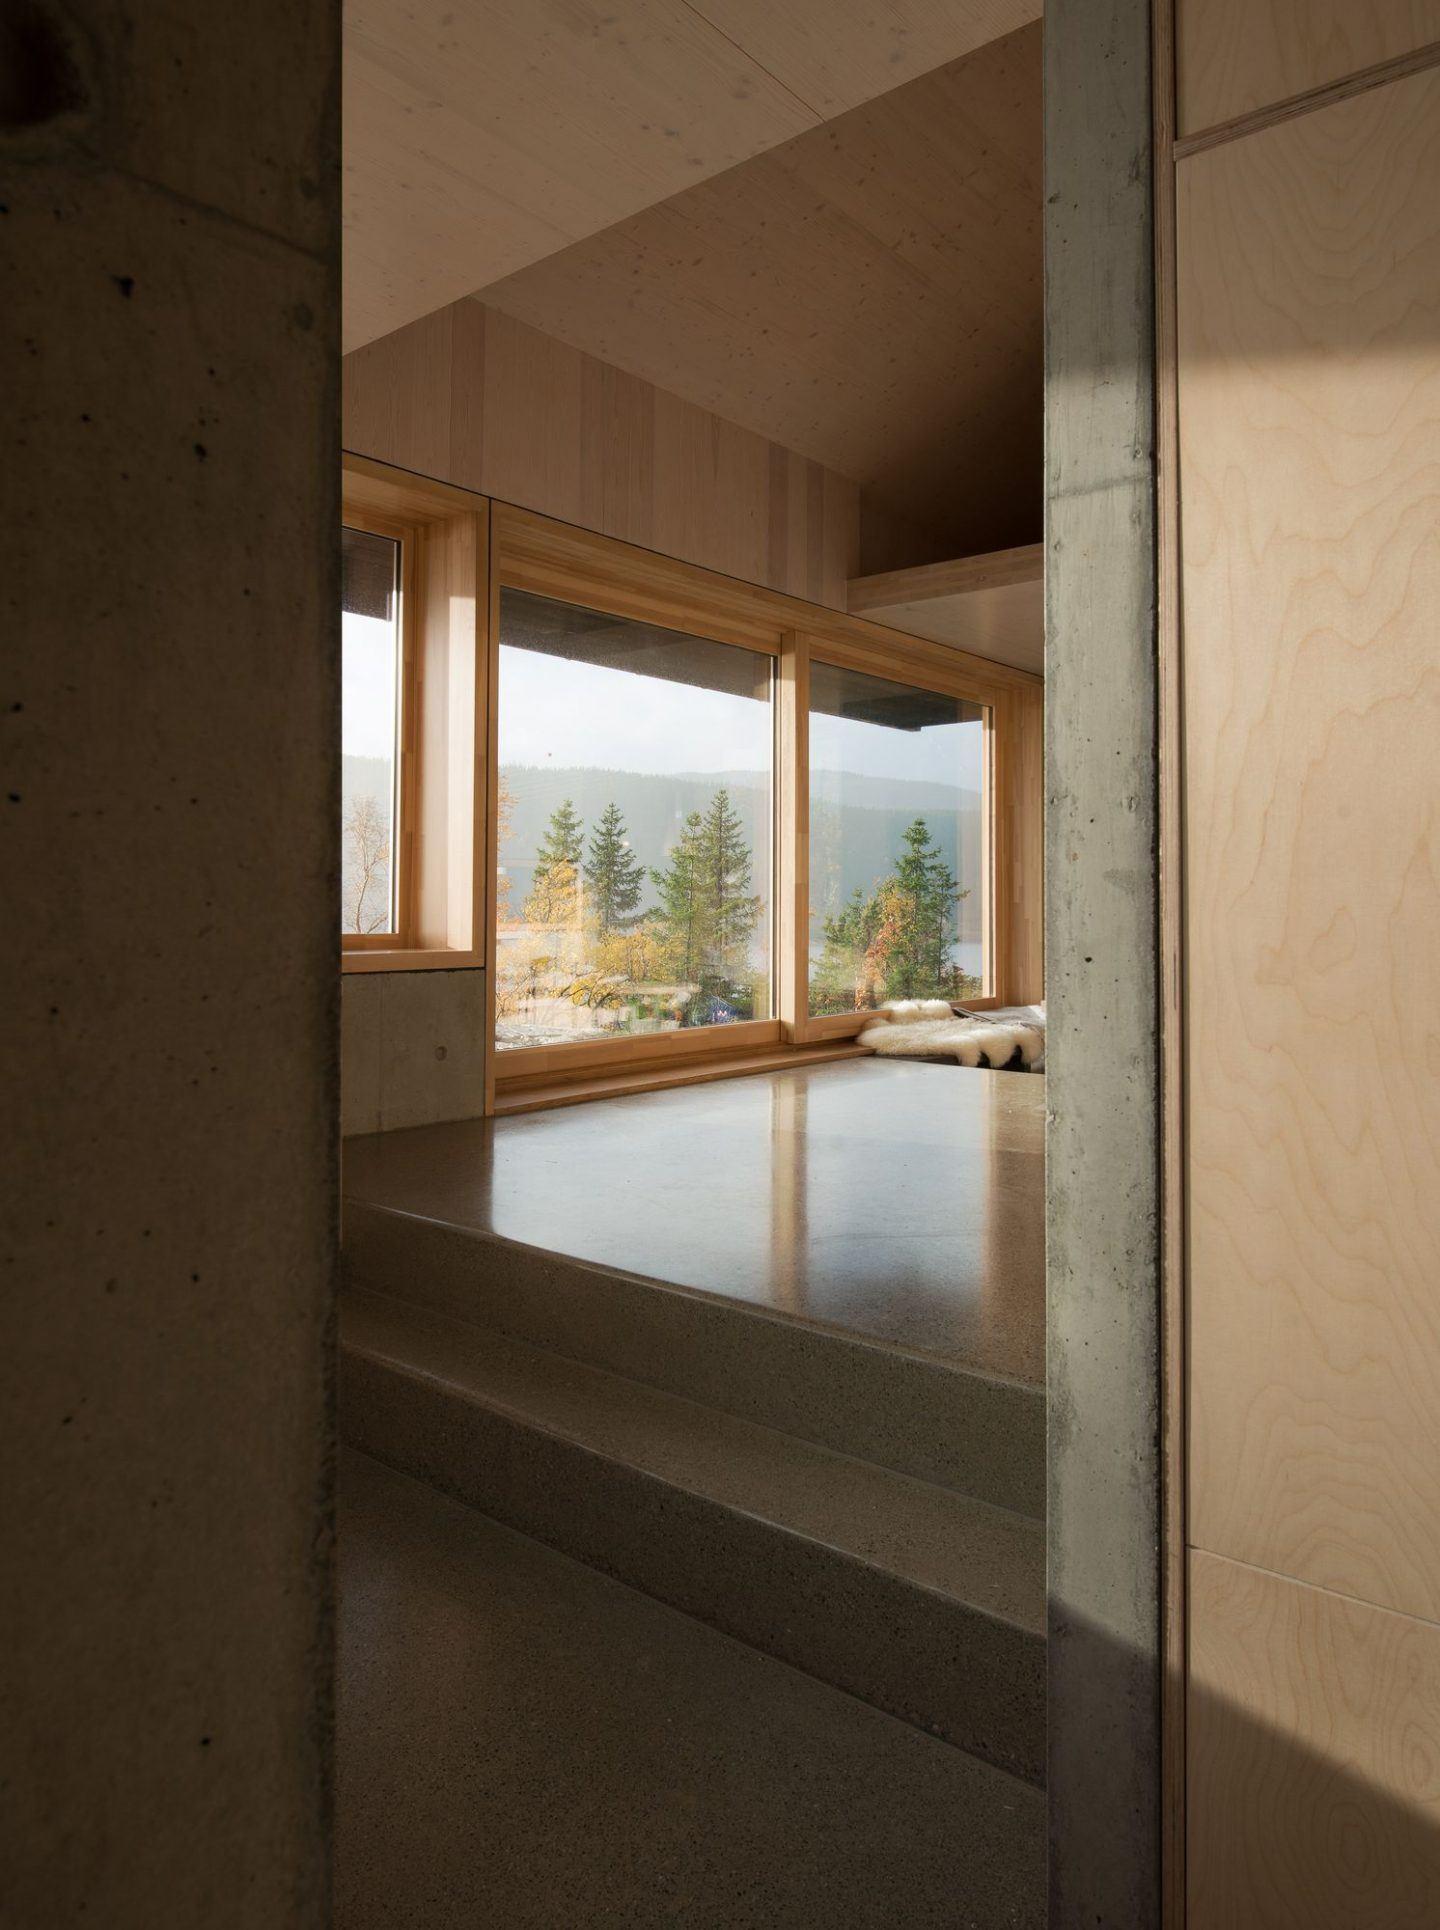 IGNANT-Architecture-Sanden-Hodnekvam-Cabin-Rones-14